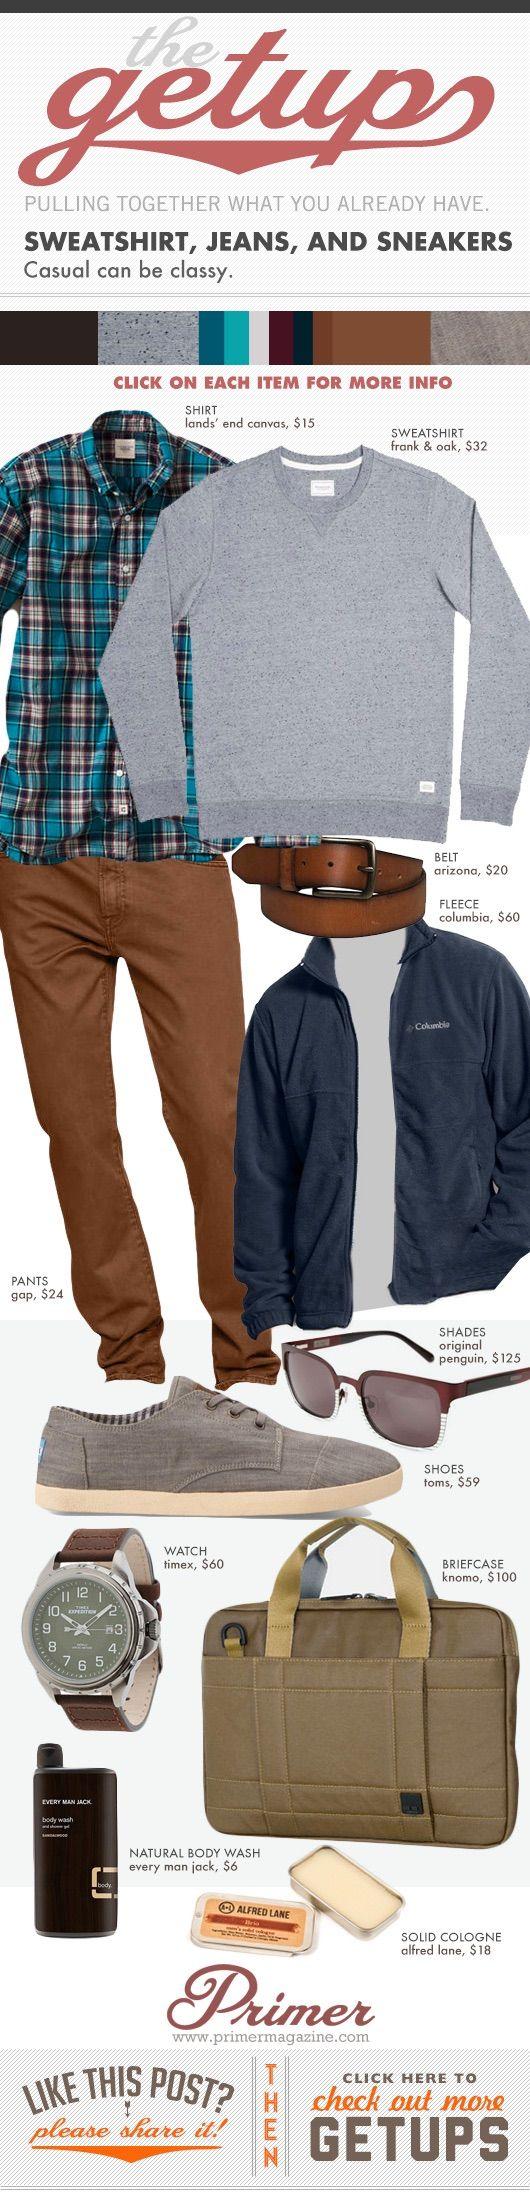 The Getup - Sweatshirt, jeans & sneakers